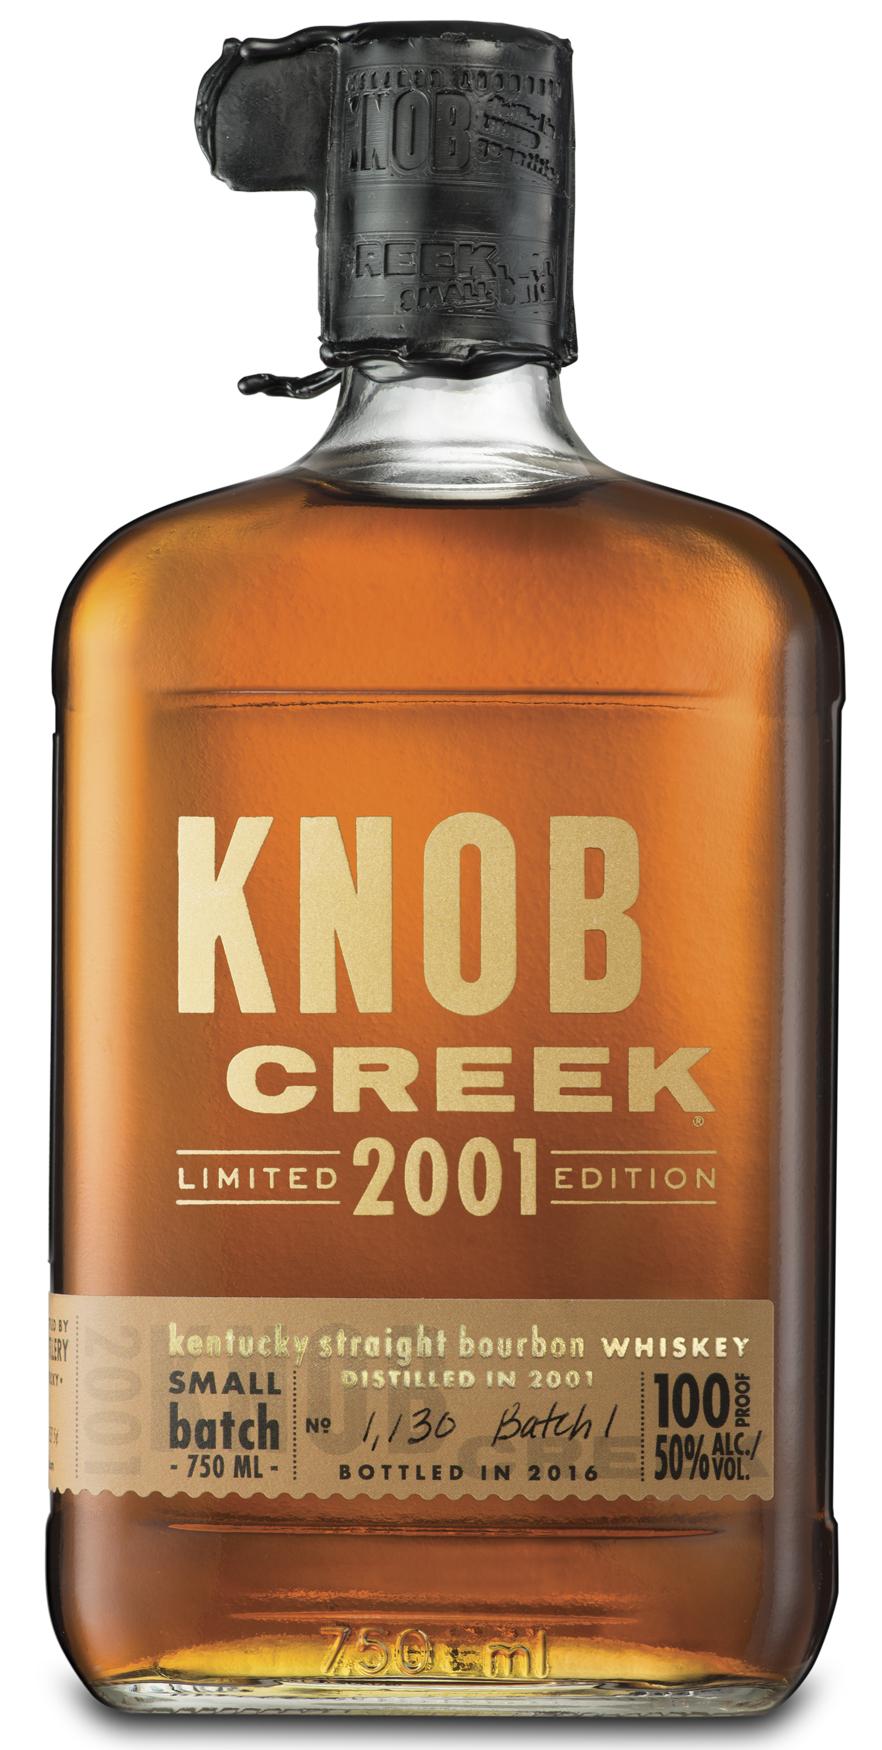 Knob Creek 2001_bottle.jpg